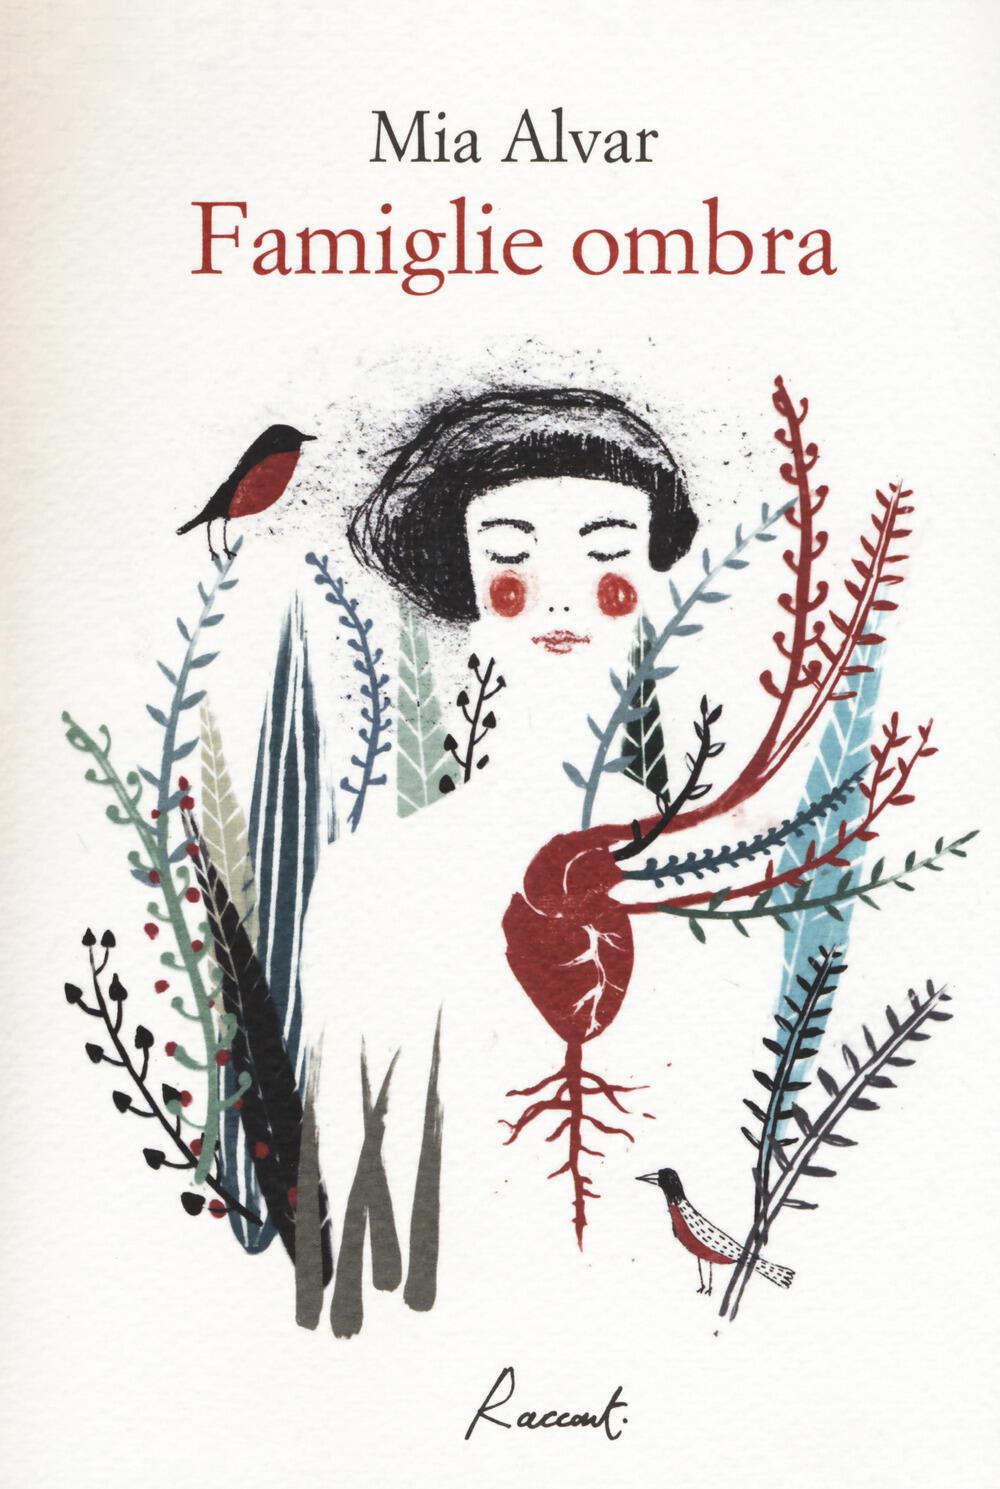 Famiglie ombra mia alvar libro racconti ibs for Ombra in inglese